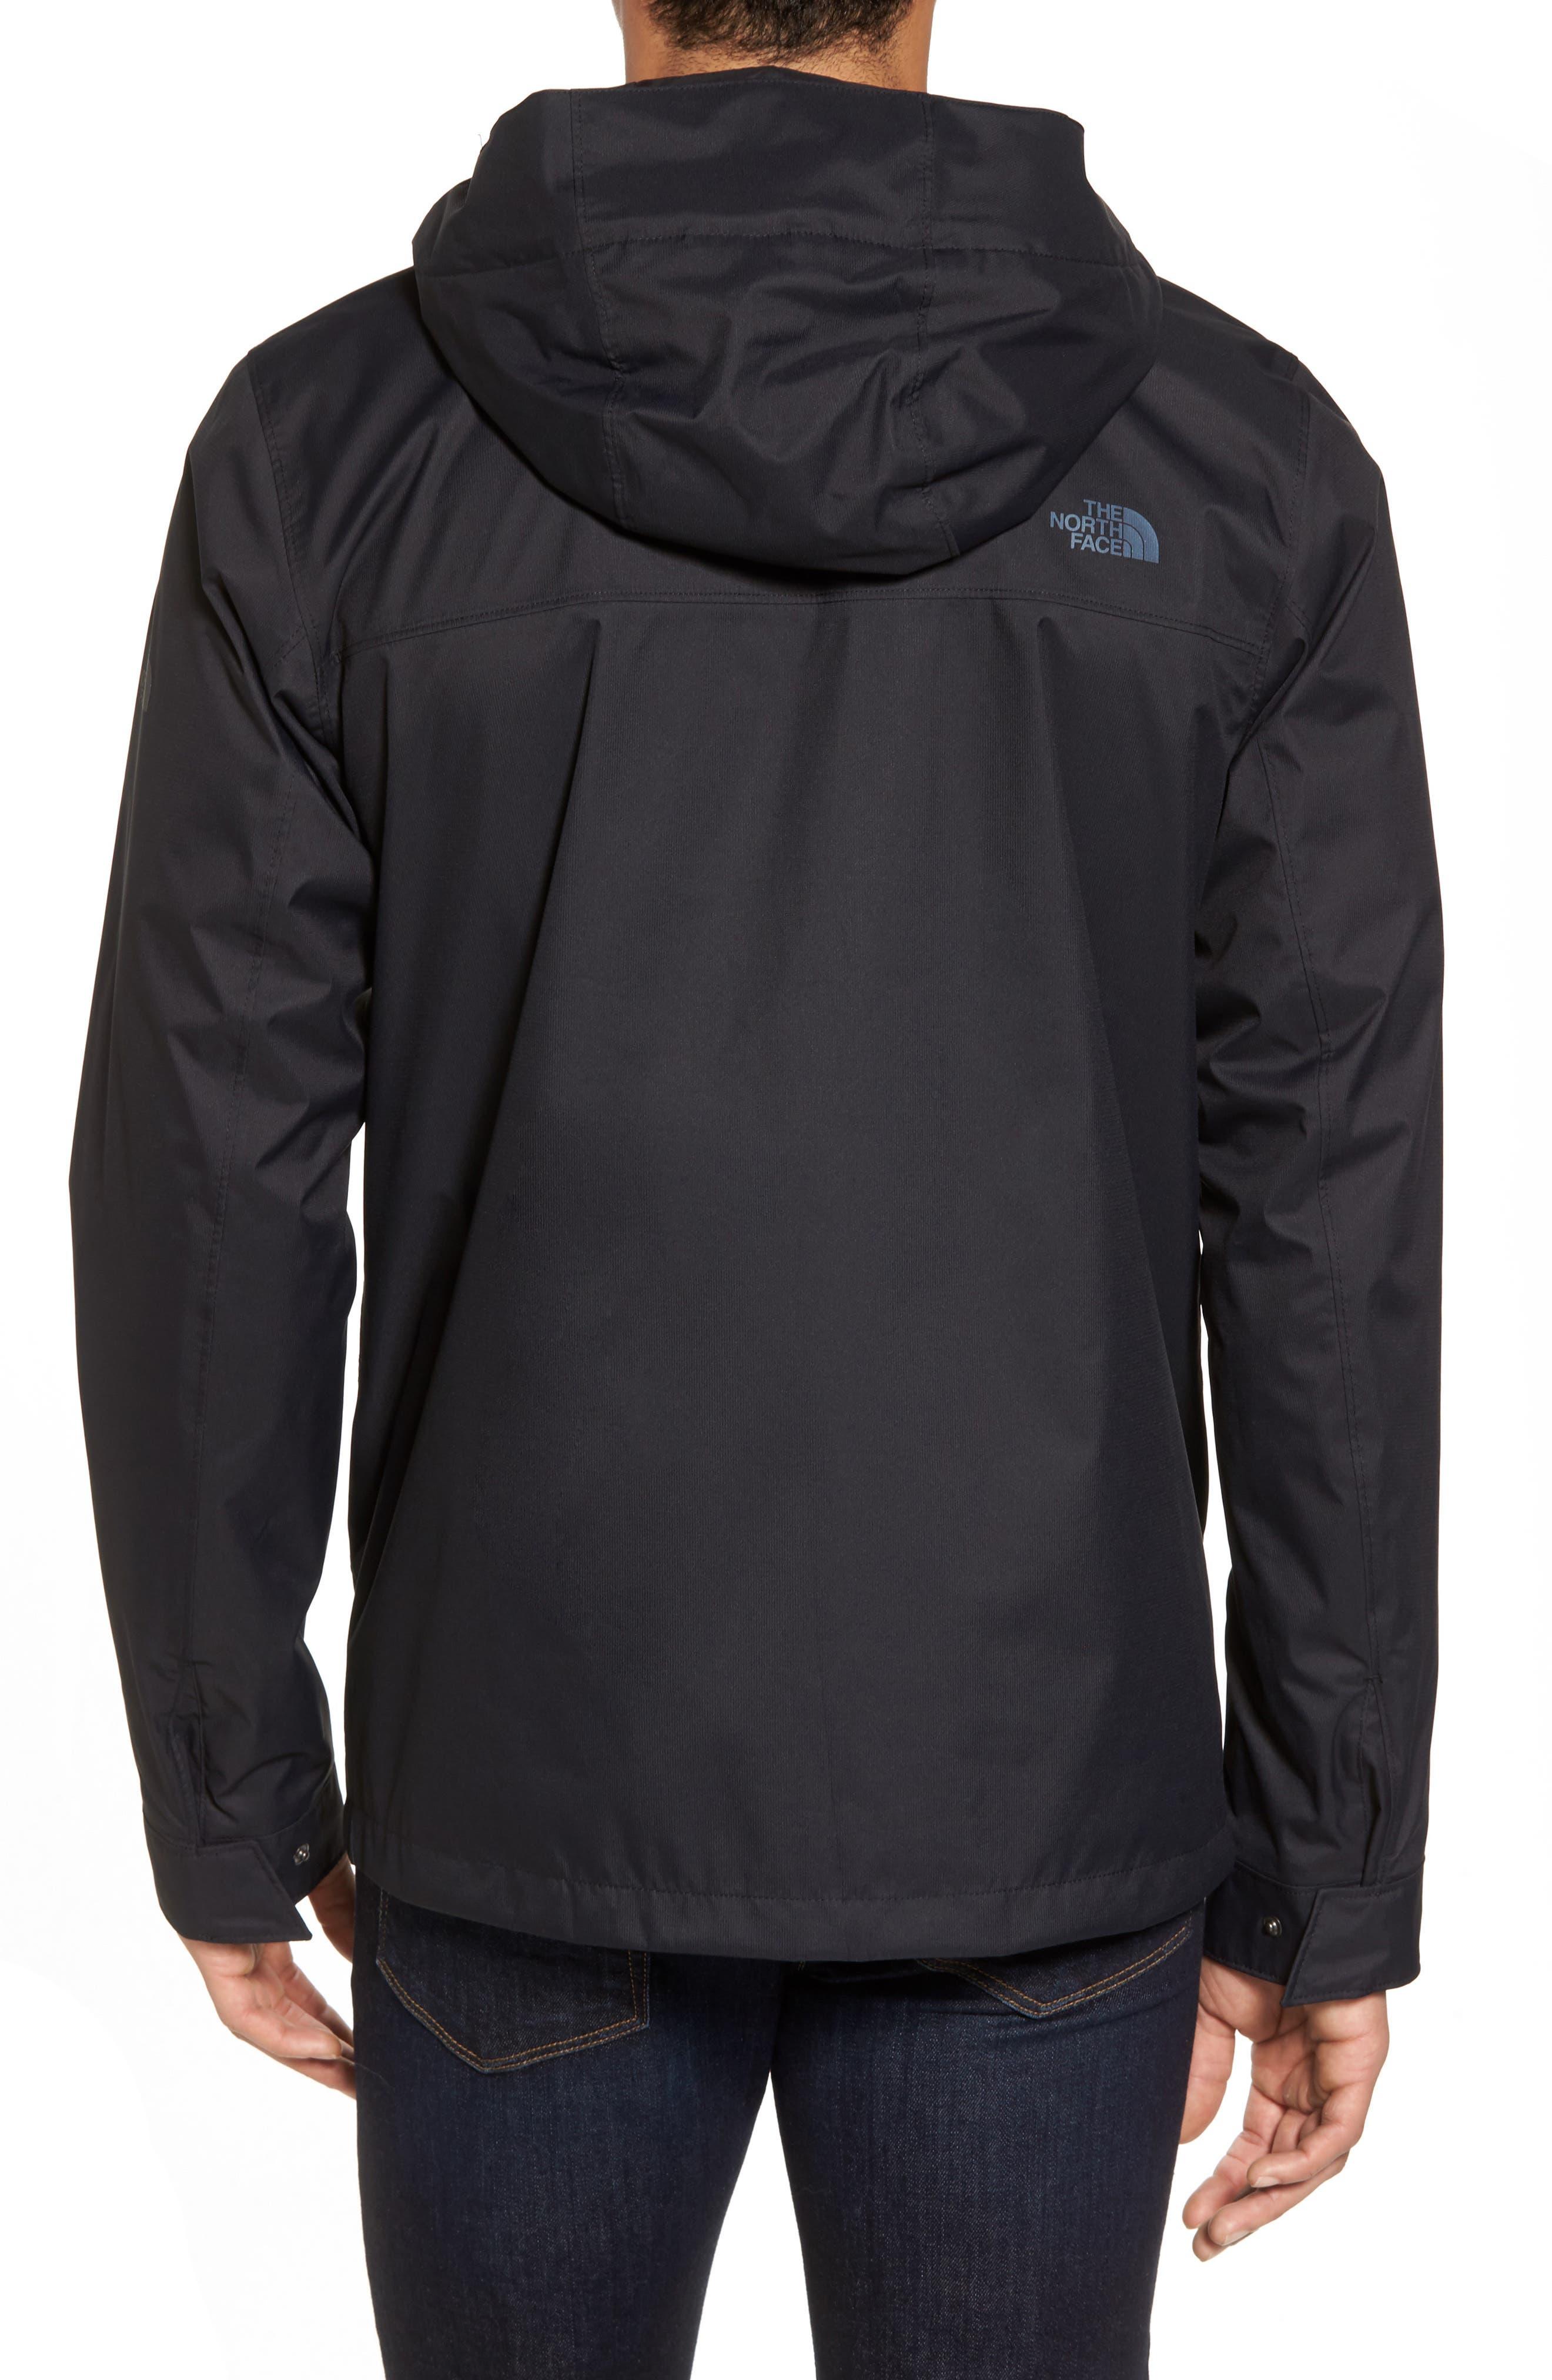 Jenison II Insulated Waterproof Jacket,                             Alternate thumbnail 2, color,                             Tnf Black